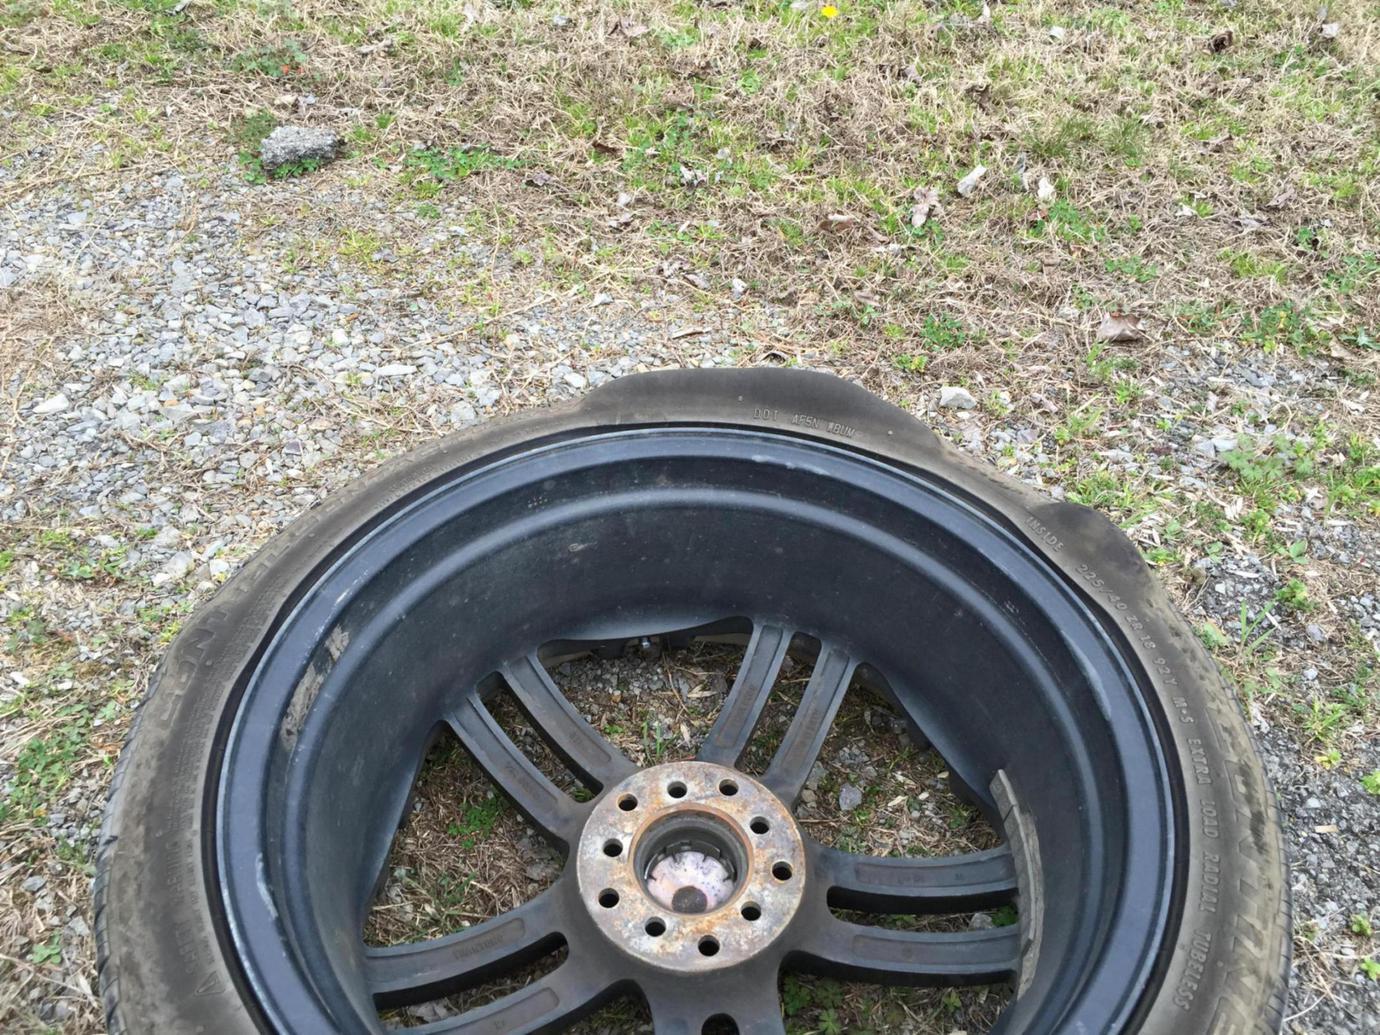 Womp Womp Sound Tires